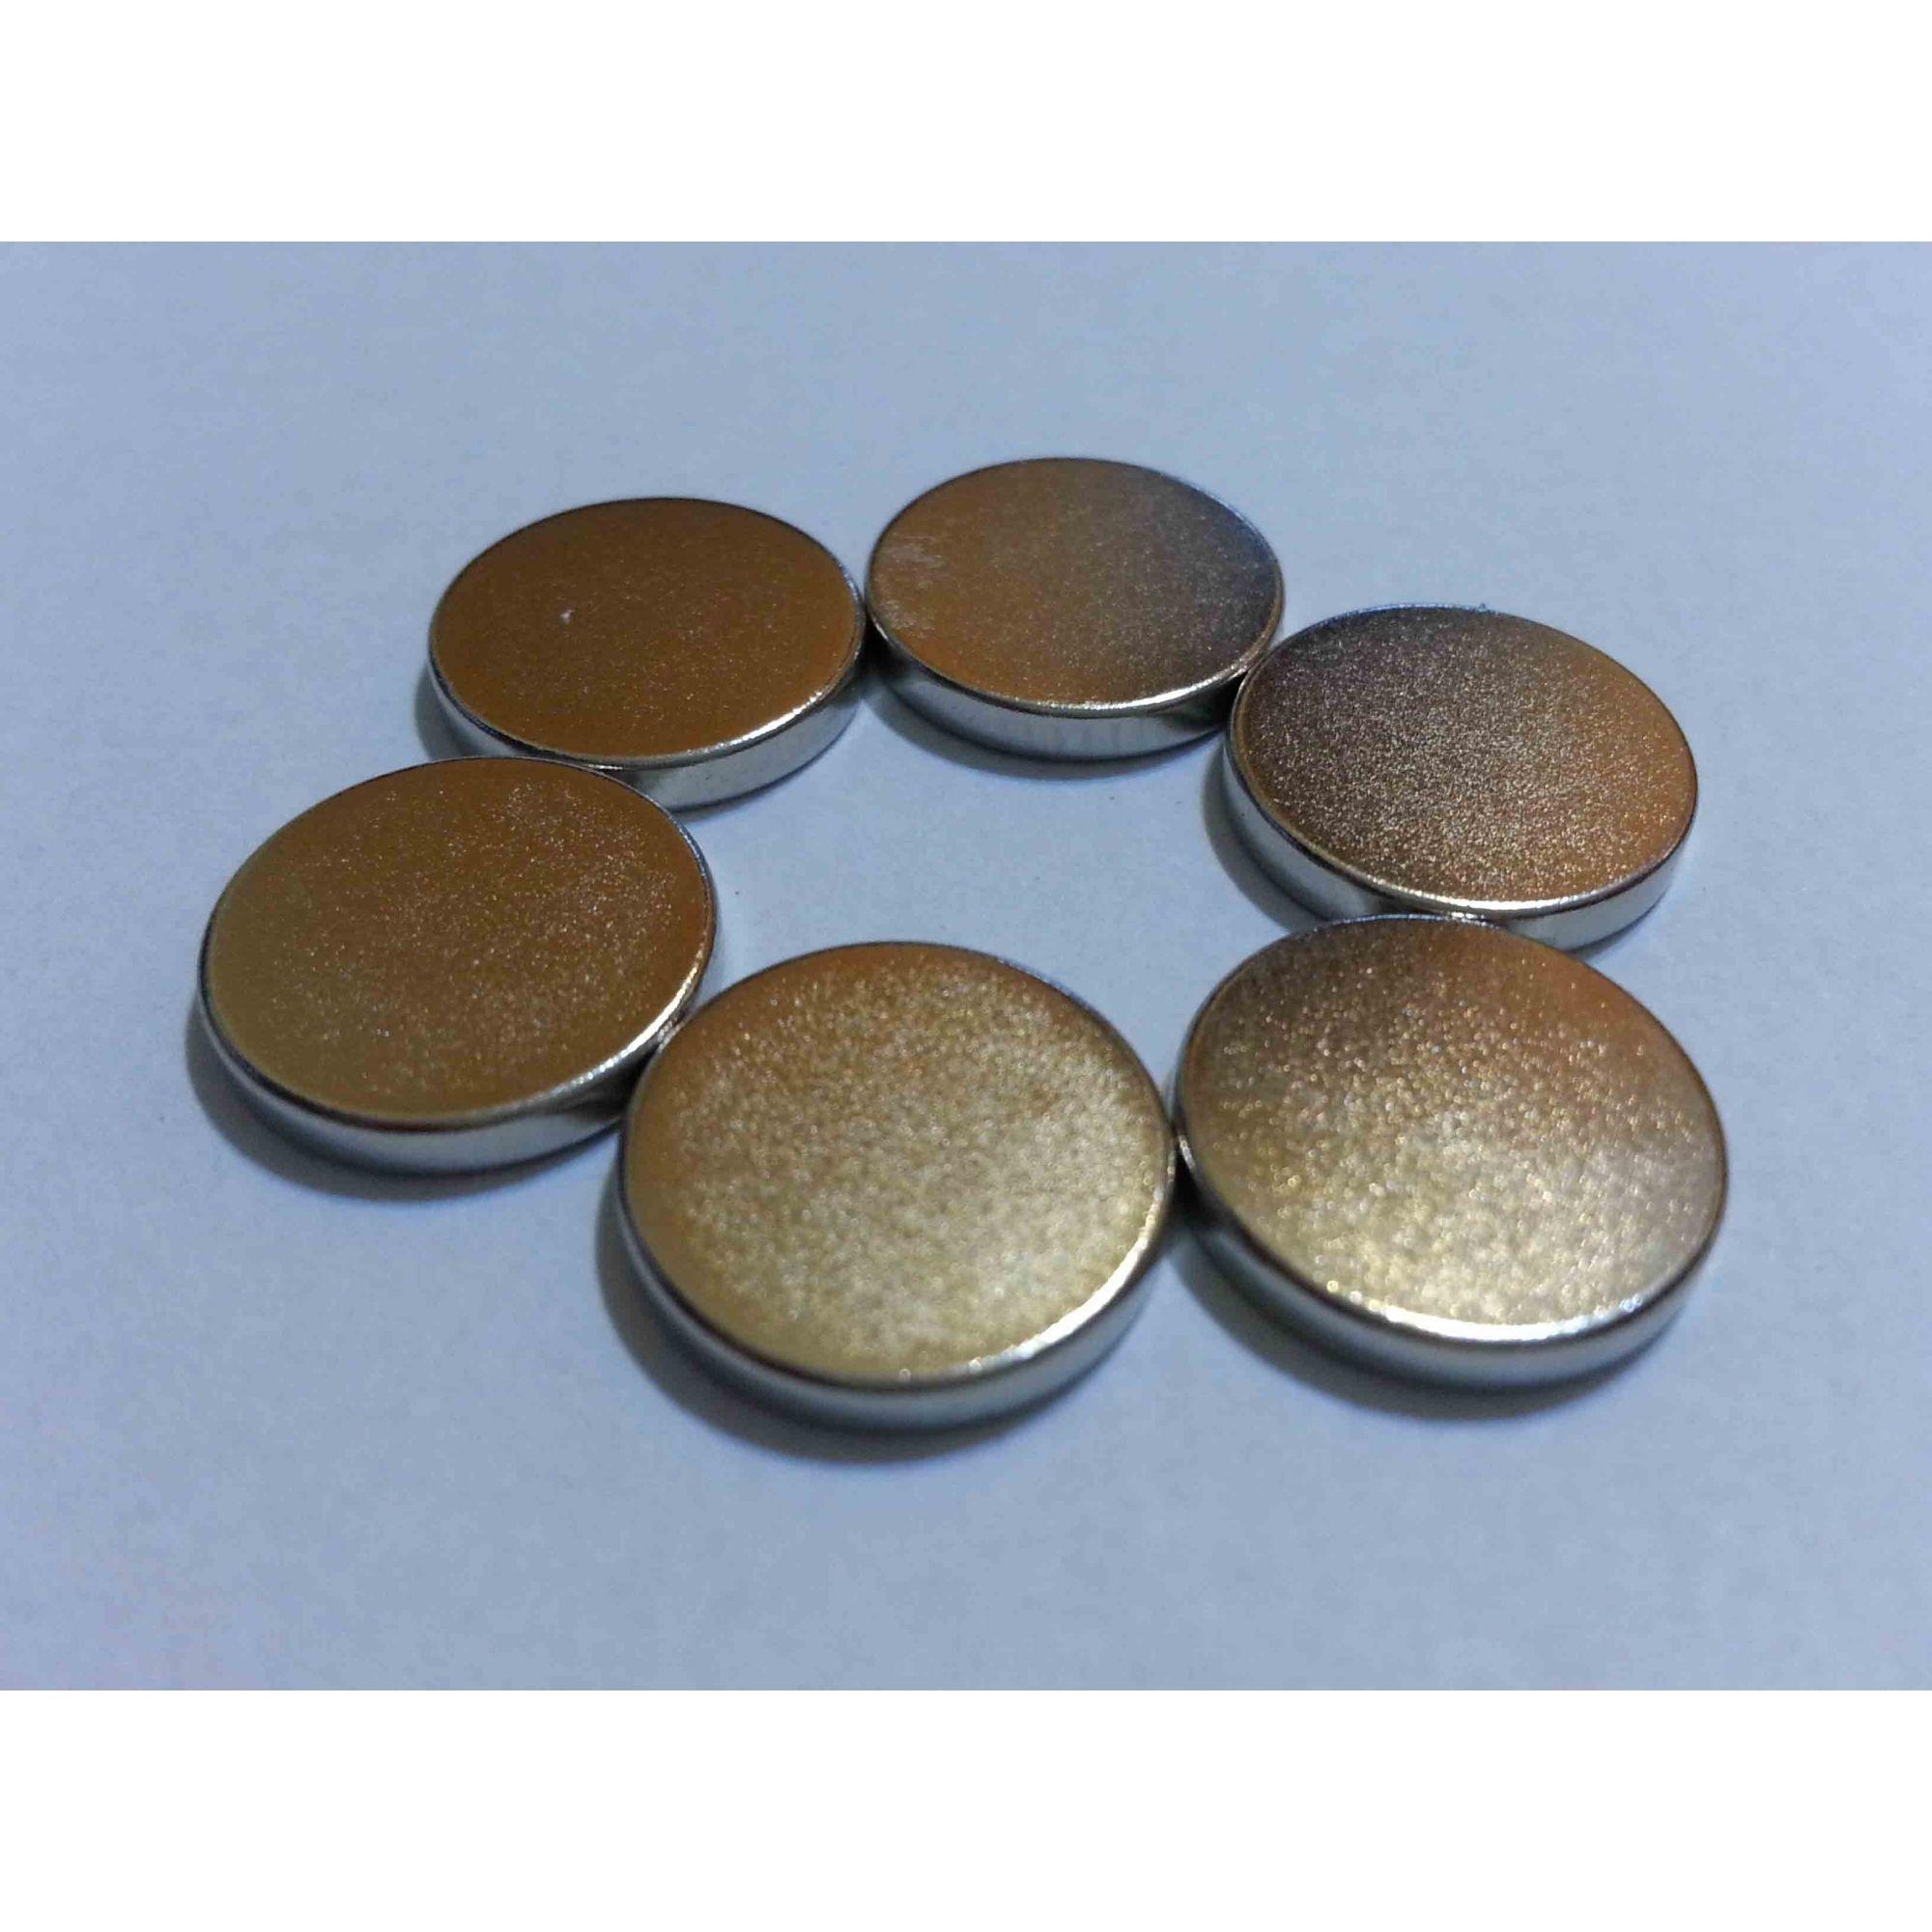 Imã de Neodímio 12,5mm x 2mm - kit com 10peças